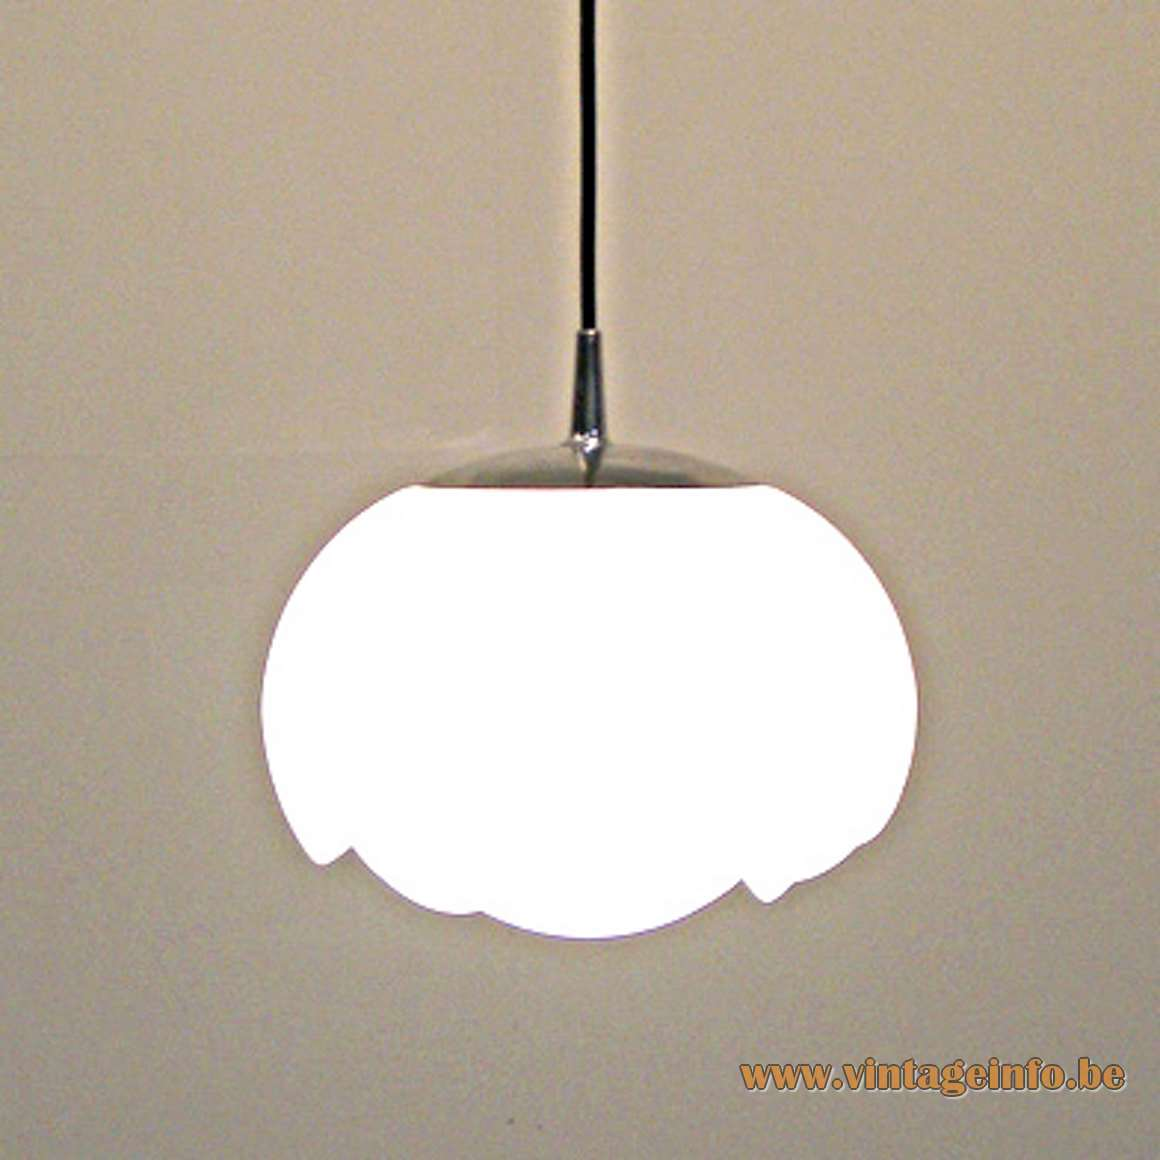 Peill + Putzler Artichoke Flush Mount or Wall Lamp - Peill + Putzler Artichoke Pendant Lamp